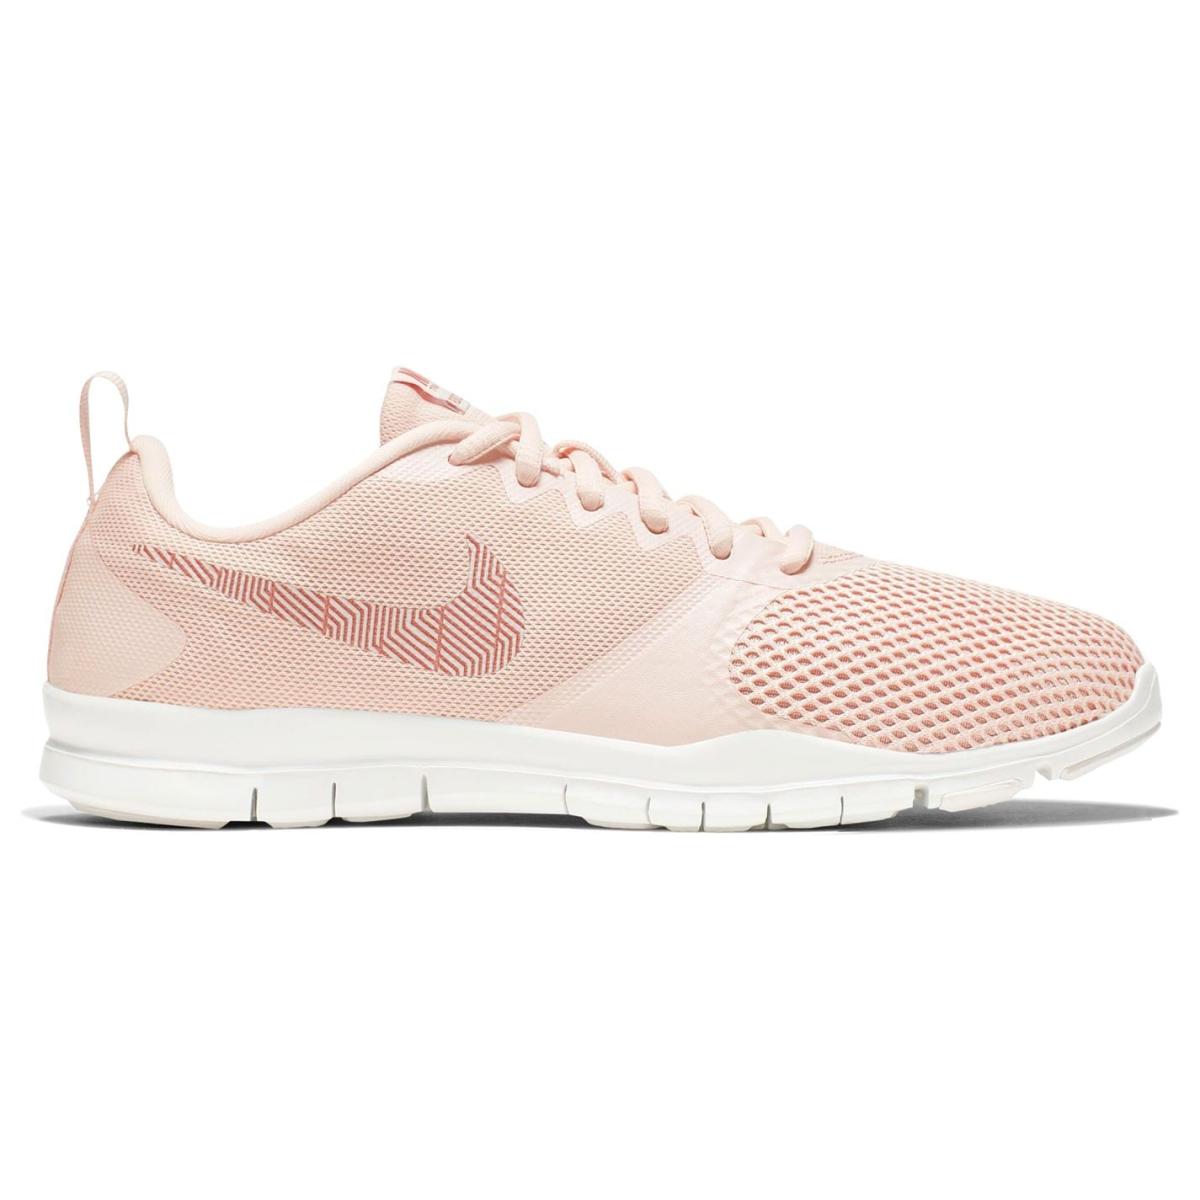 Nike-Flex-Laufschuhe-Turnschuhe-Damen-Sneaker-Sportschuhe-Jogging-3088 Indexbild 18